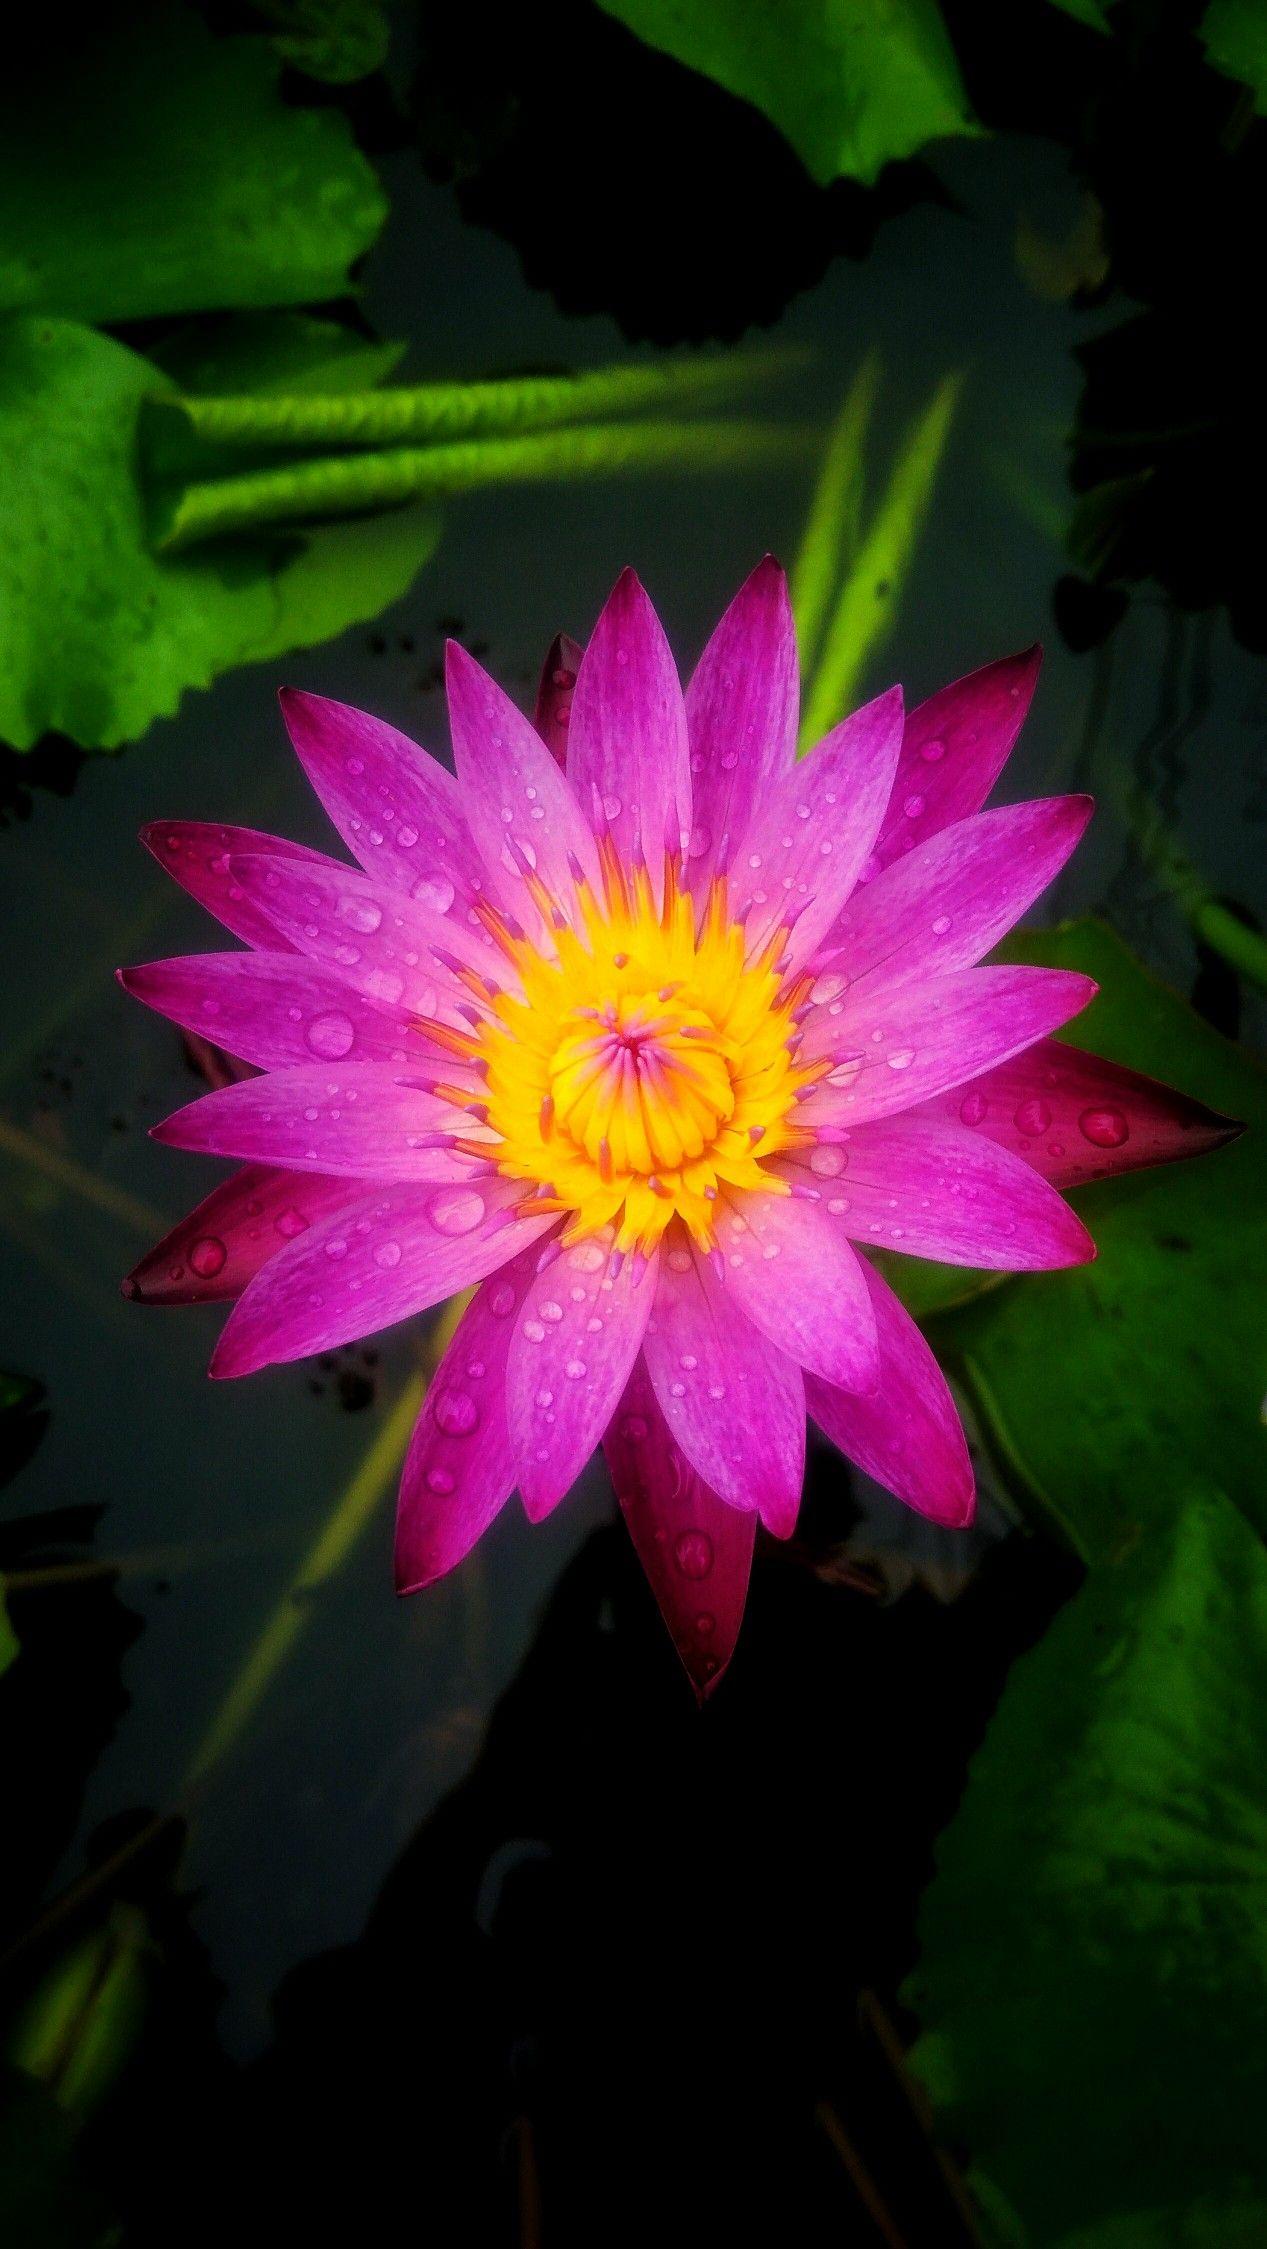 Beautiful pink lotus flower flowers pinterest flowers beautiful pink lotus flower izmirmasajfo